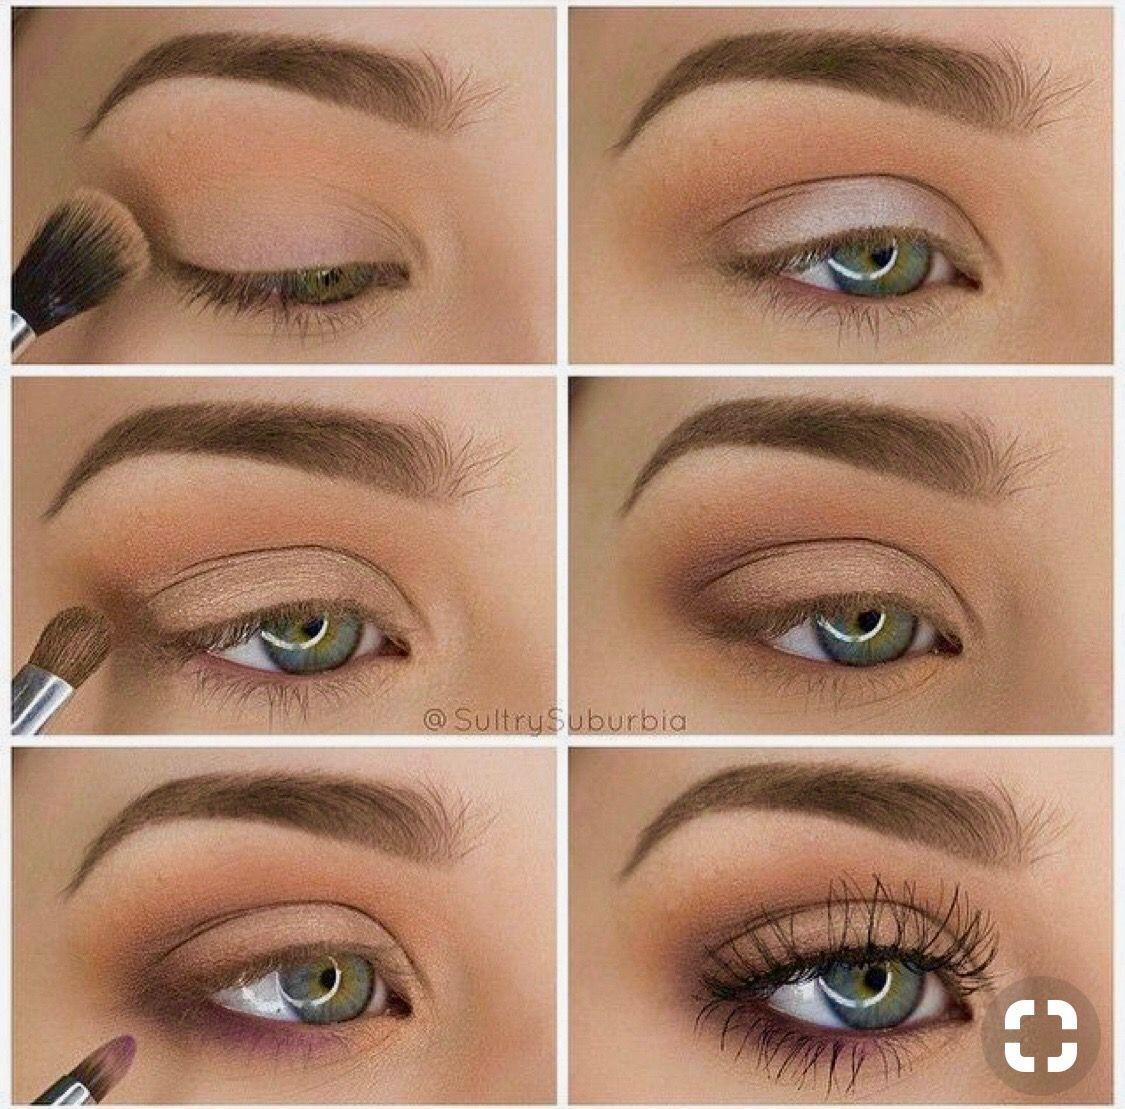 Pin on makeup looks & tutorials